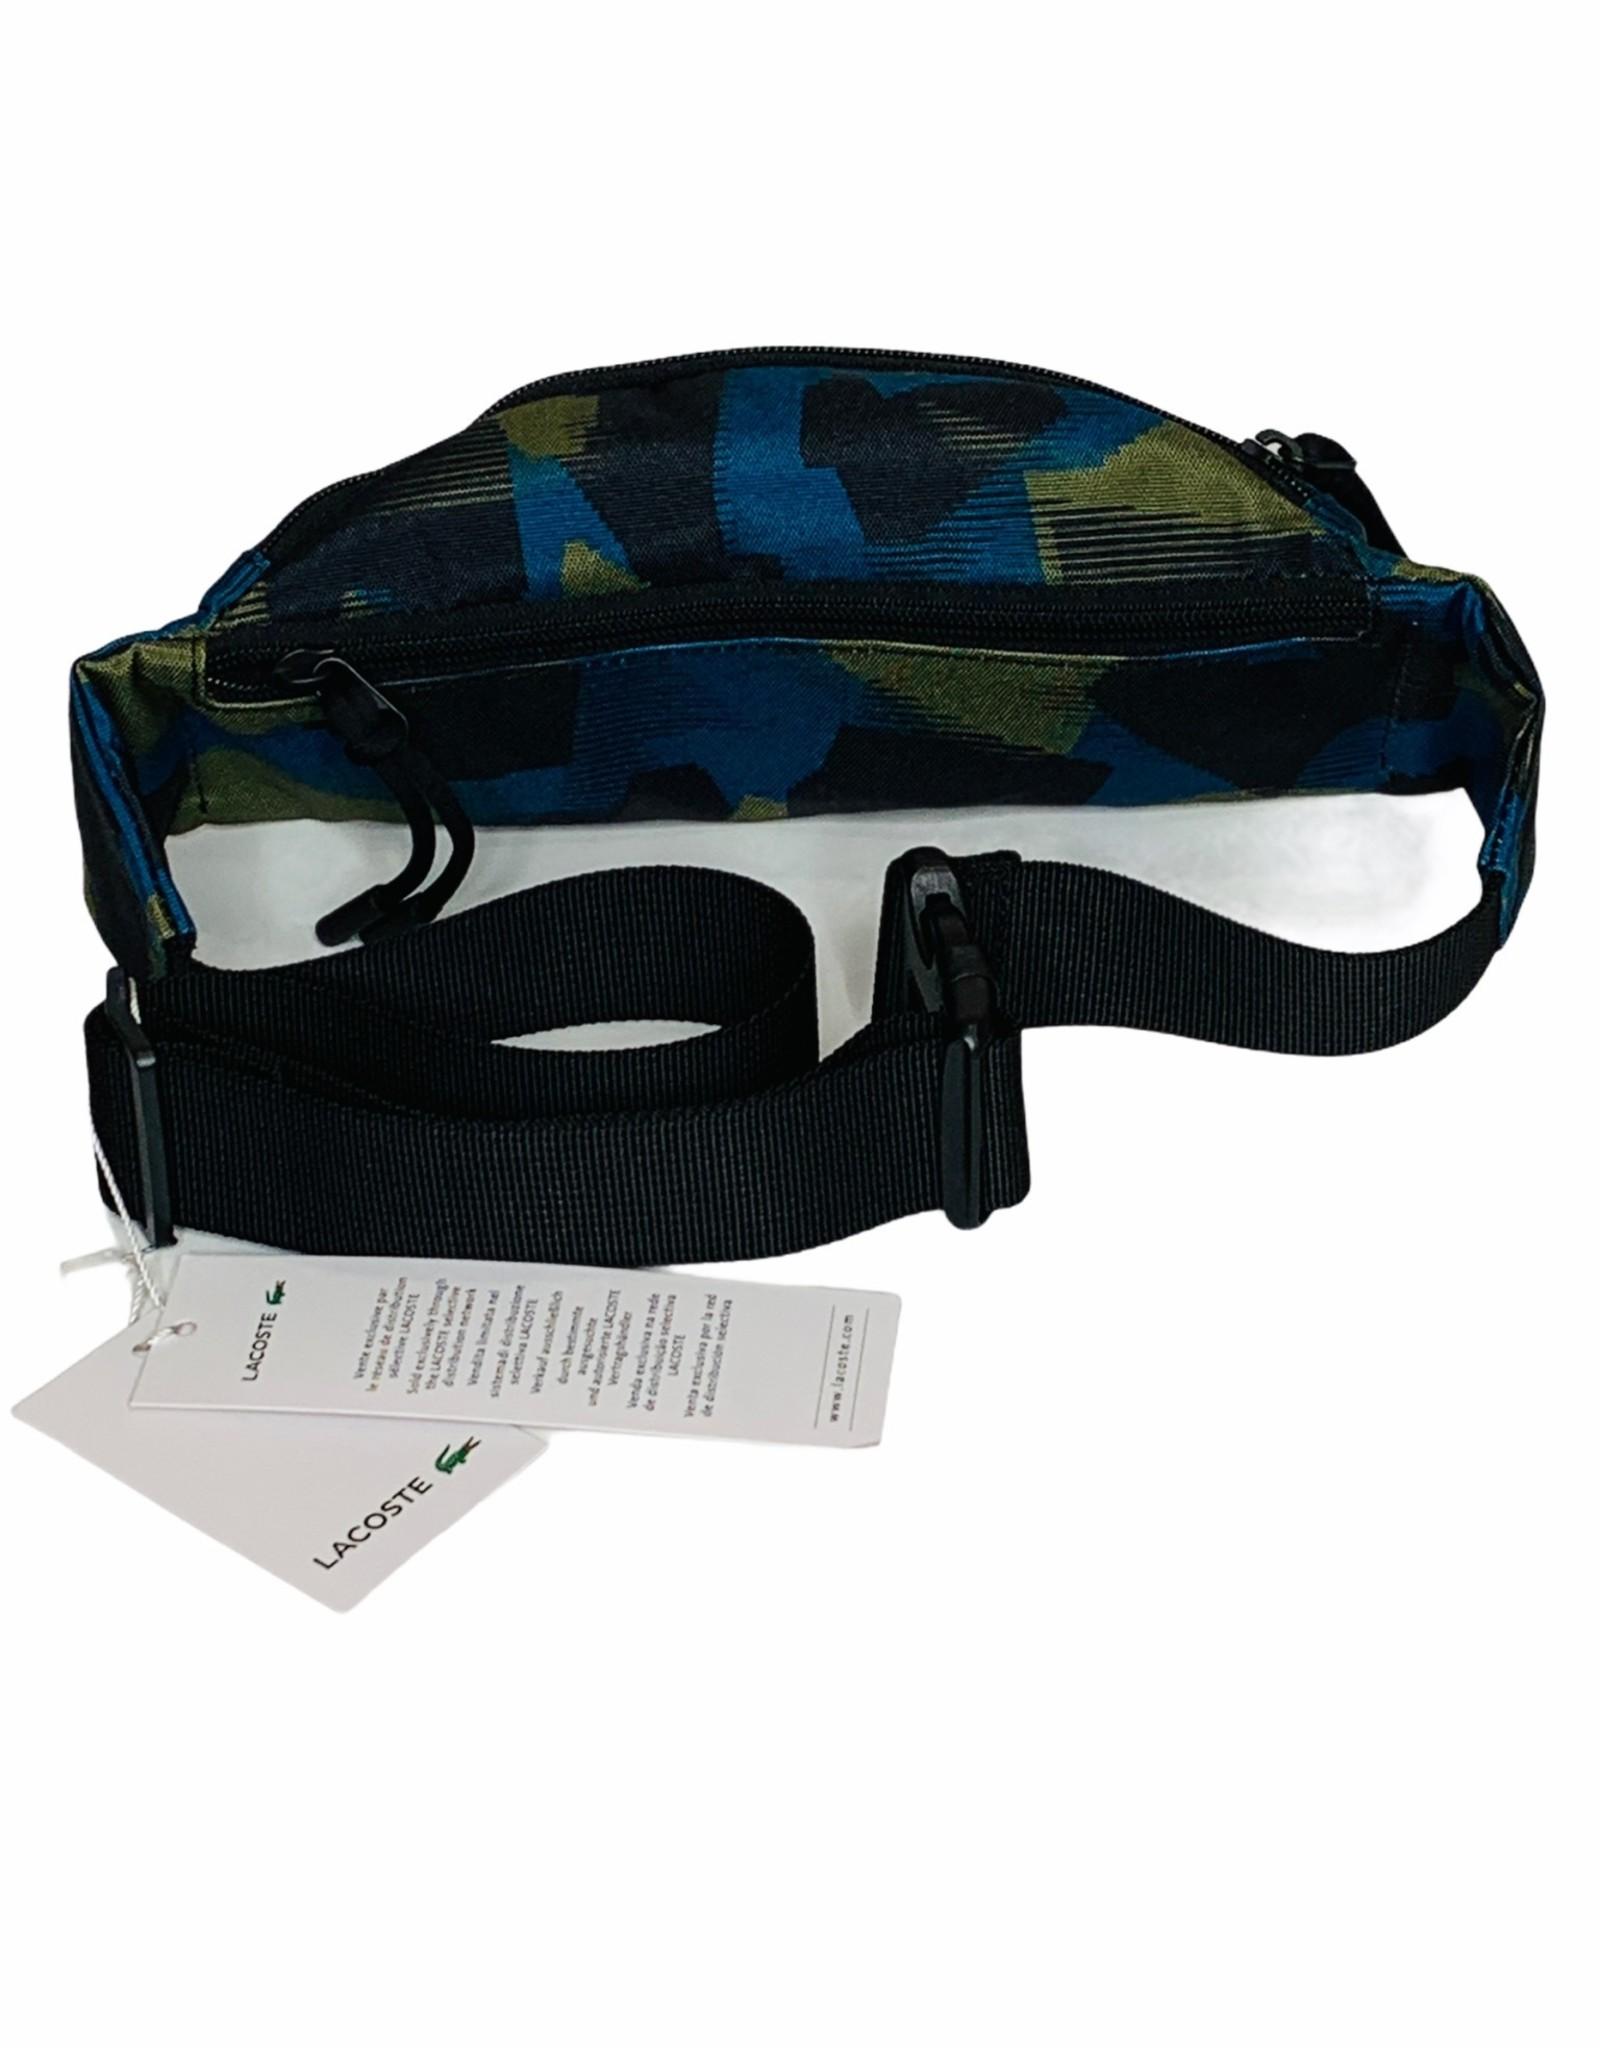 Lacoste Lacoste Nylon Belt Bag